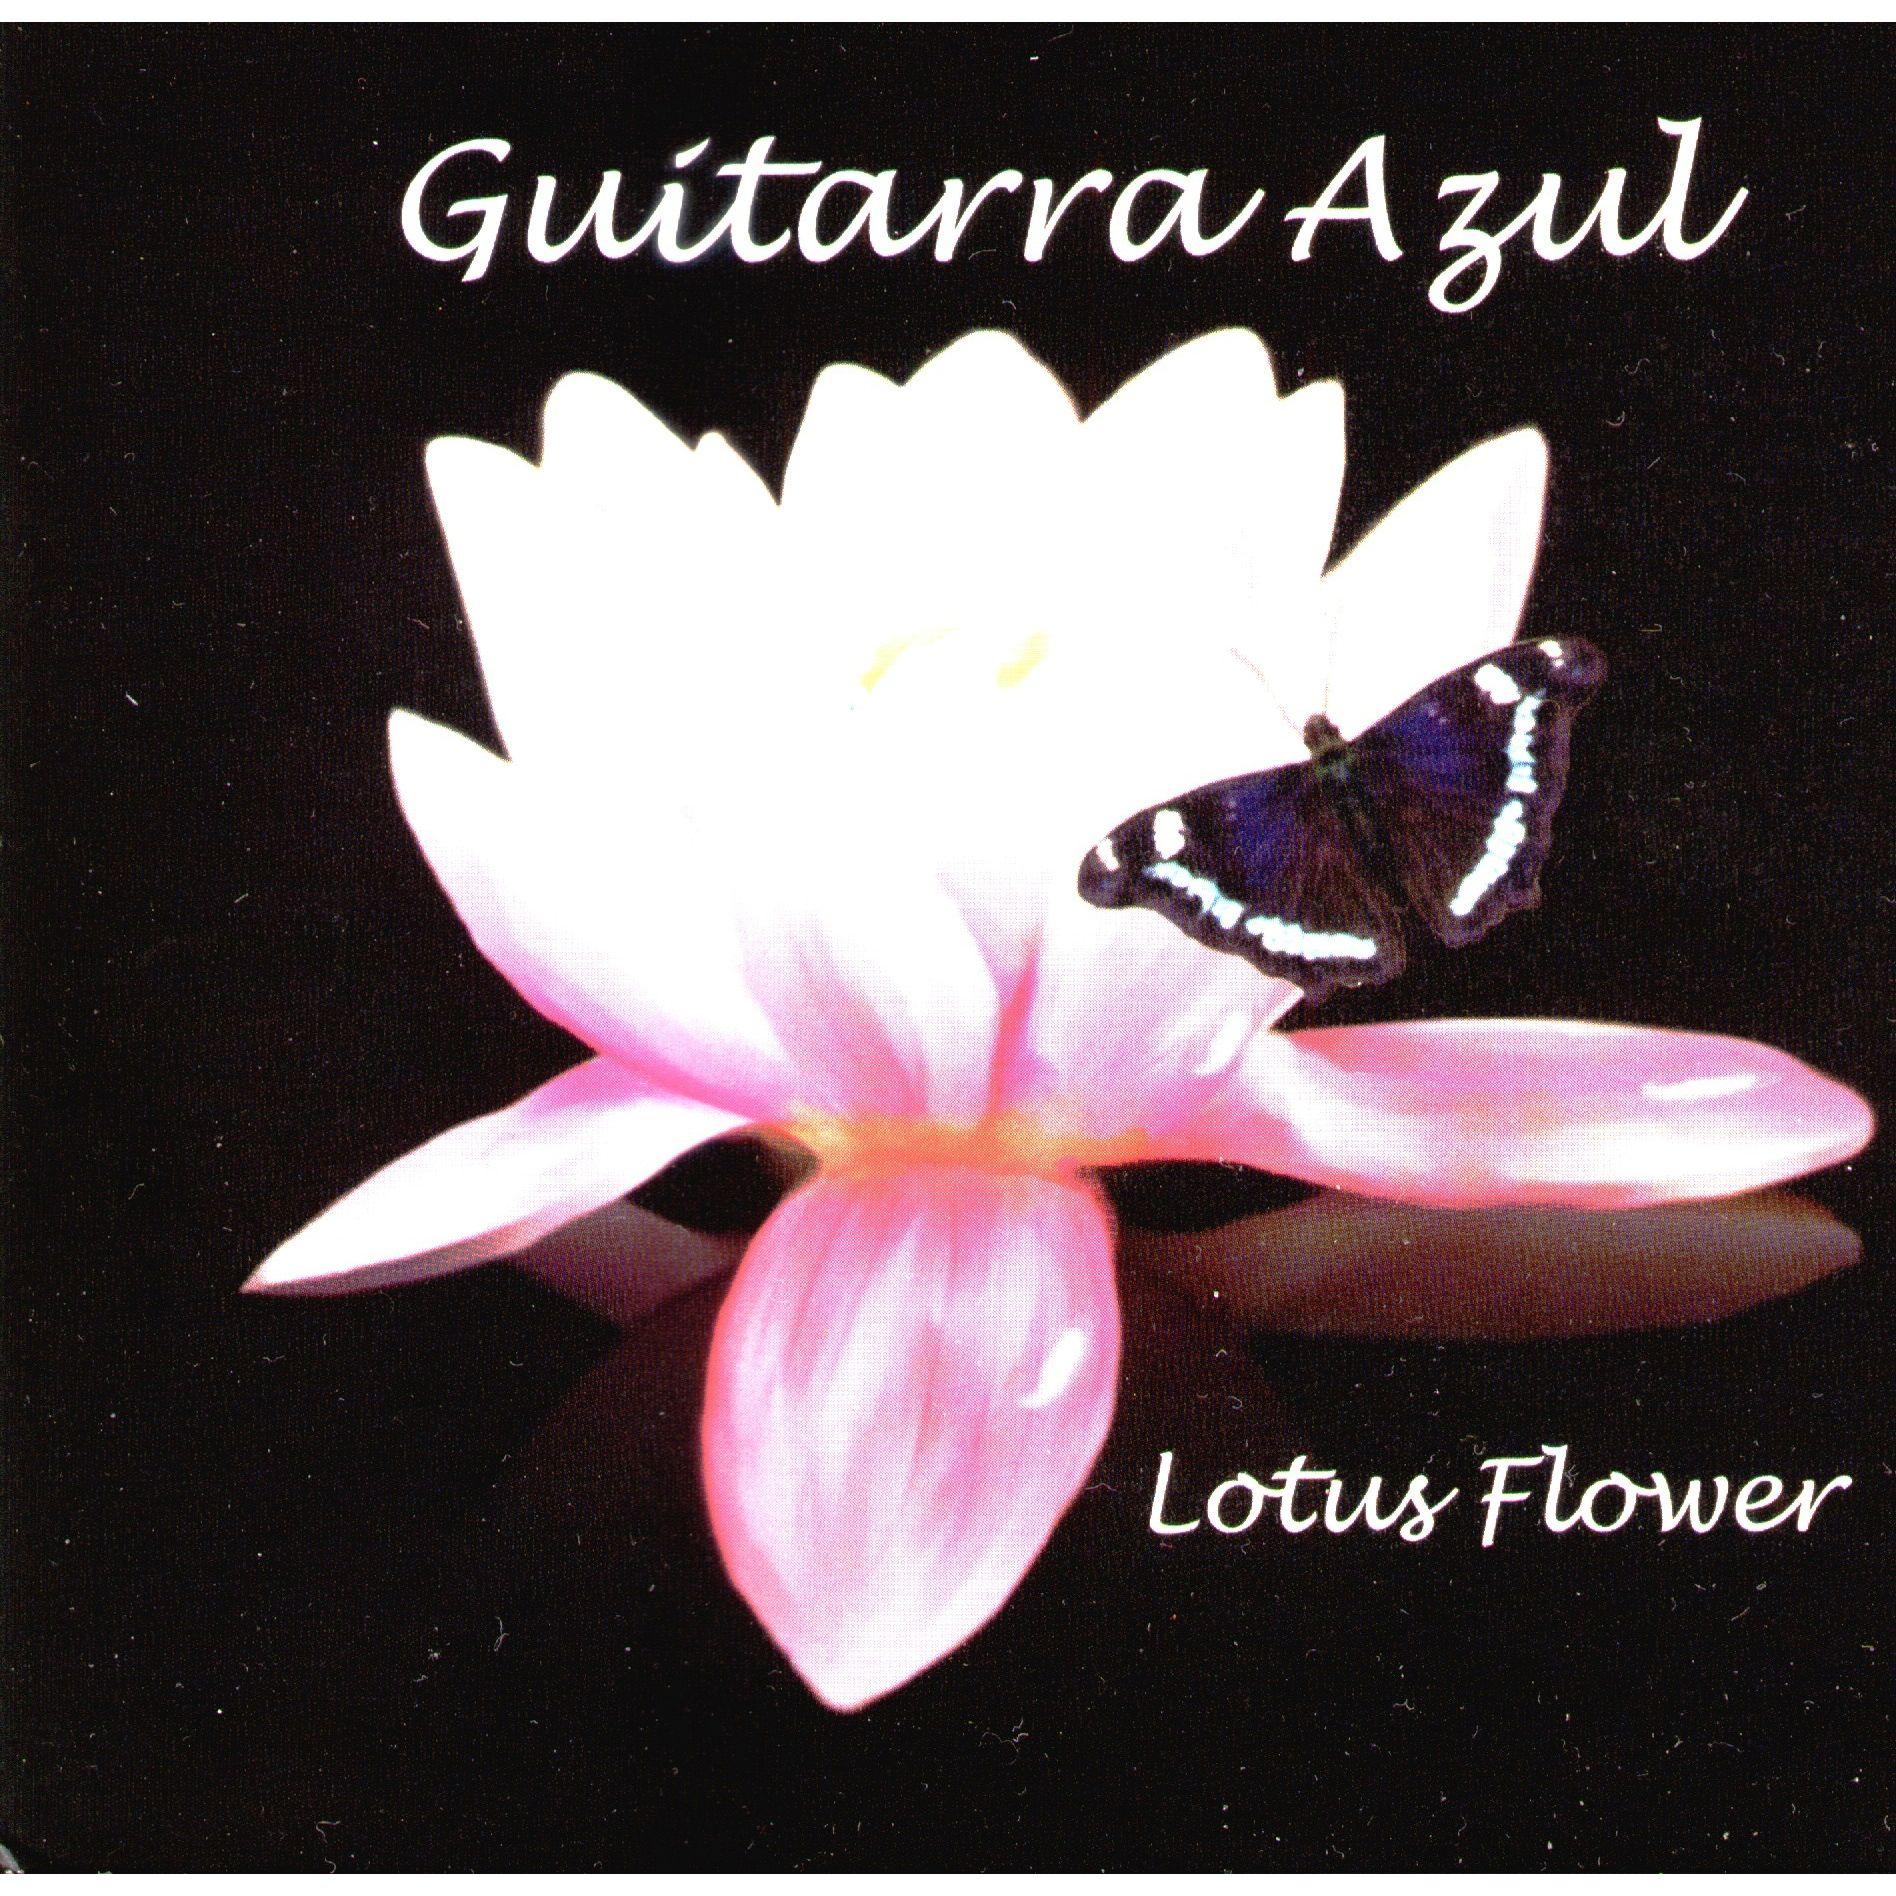 Fshare Guitarra Azul Lotus Flower 2012 Flac